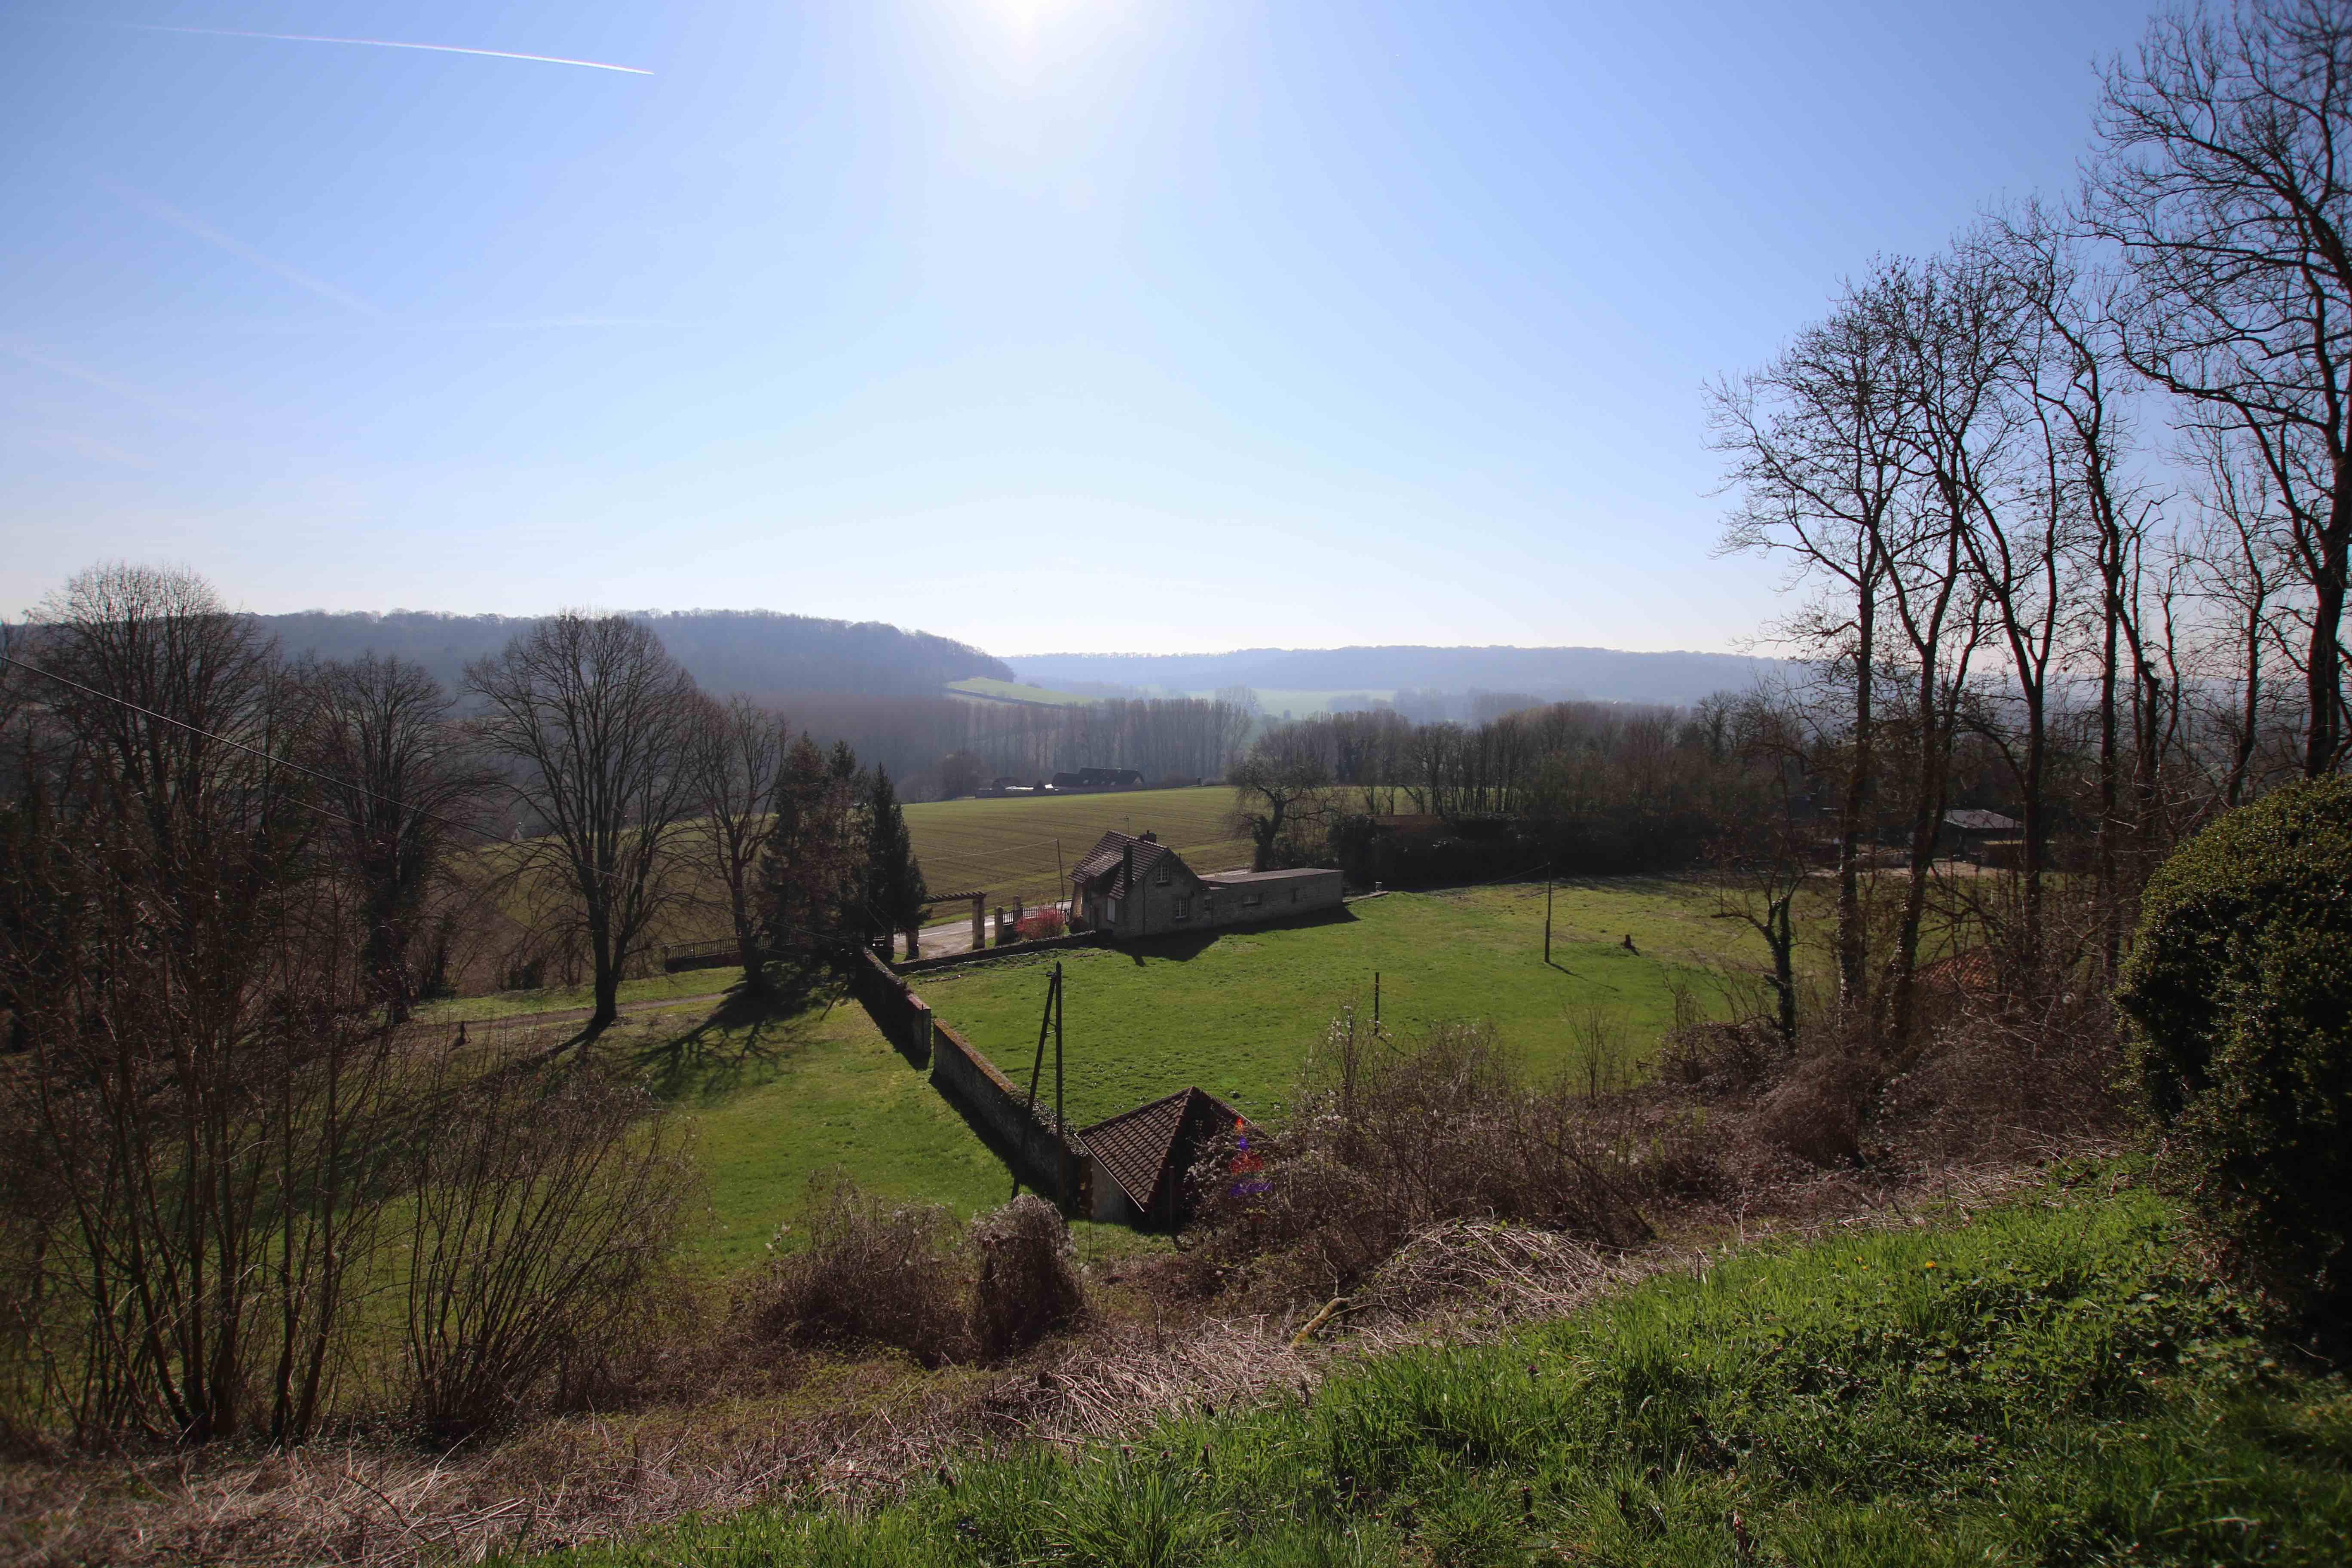 Panorama sur la campagne picarde